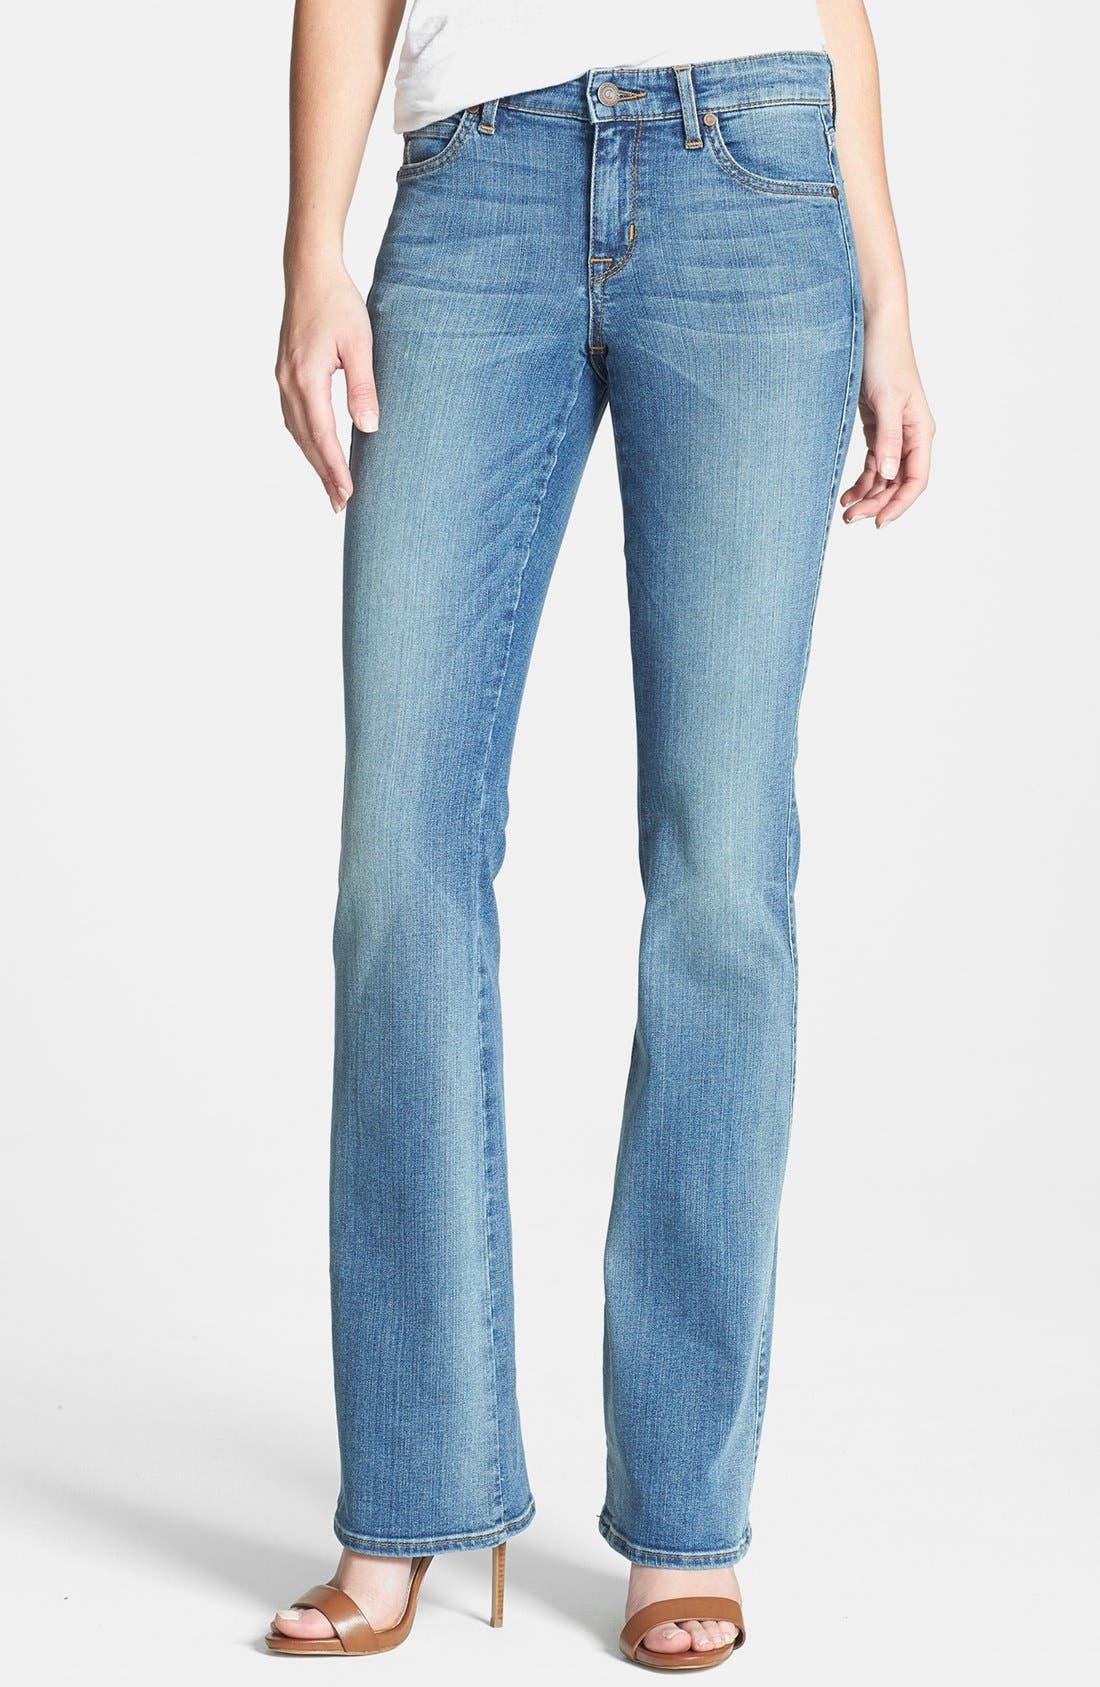 Main Image - CJ by Cookie Johnson 'Grace' Bootcut Jeans (Aliamanu)